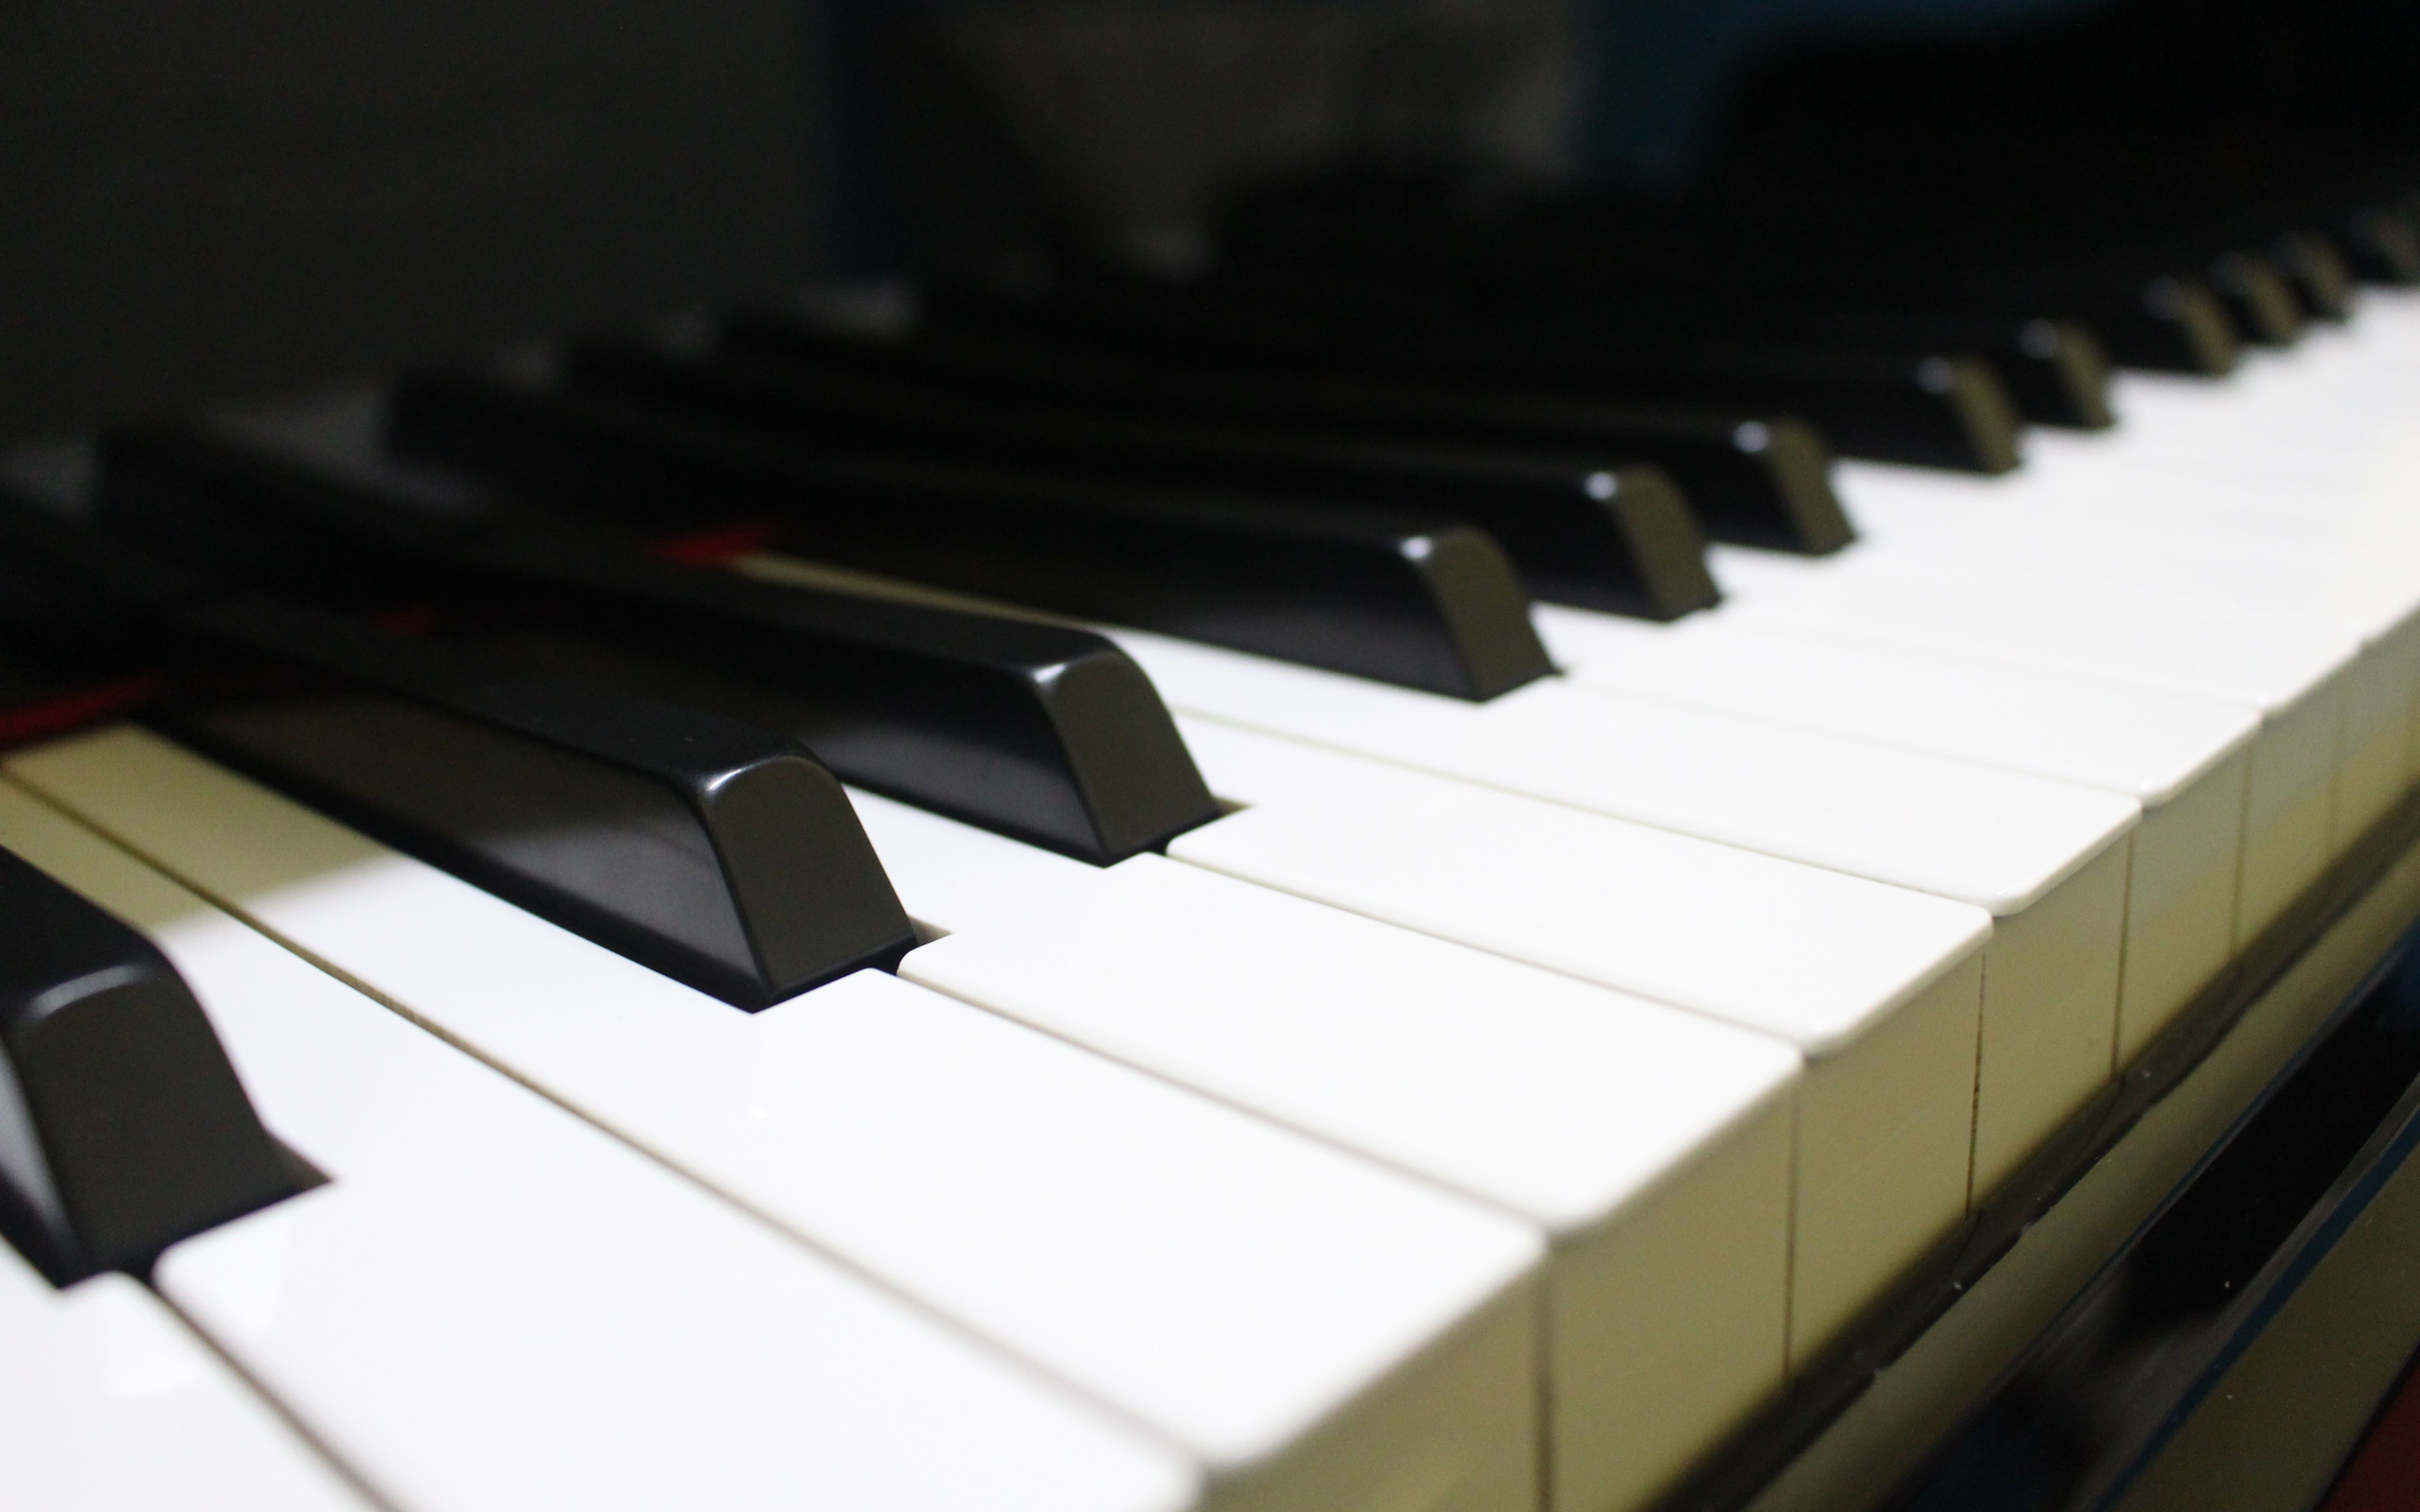 现代钢琴基础教程2_【钢琴入门】傻瓜教程3_哔哩哔哩 (゜-゜)つロ 干杯~-bilibili